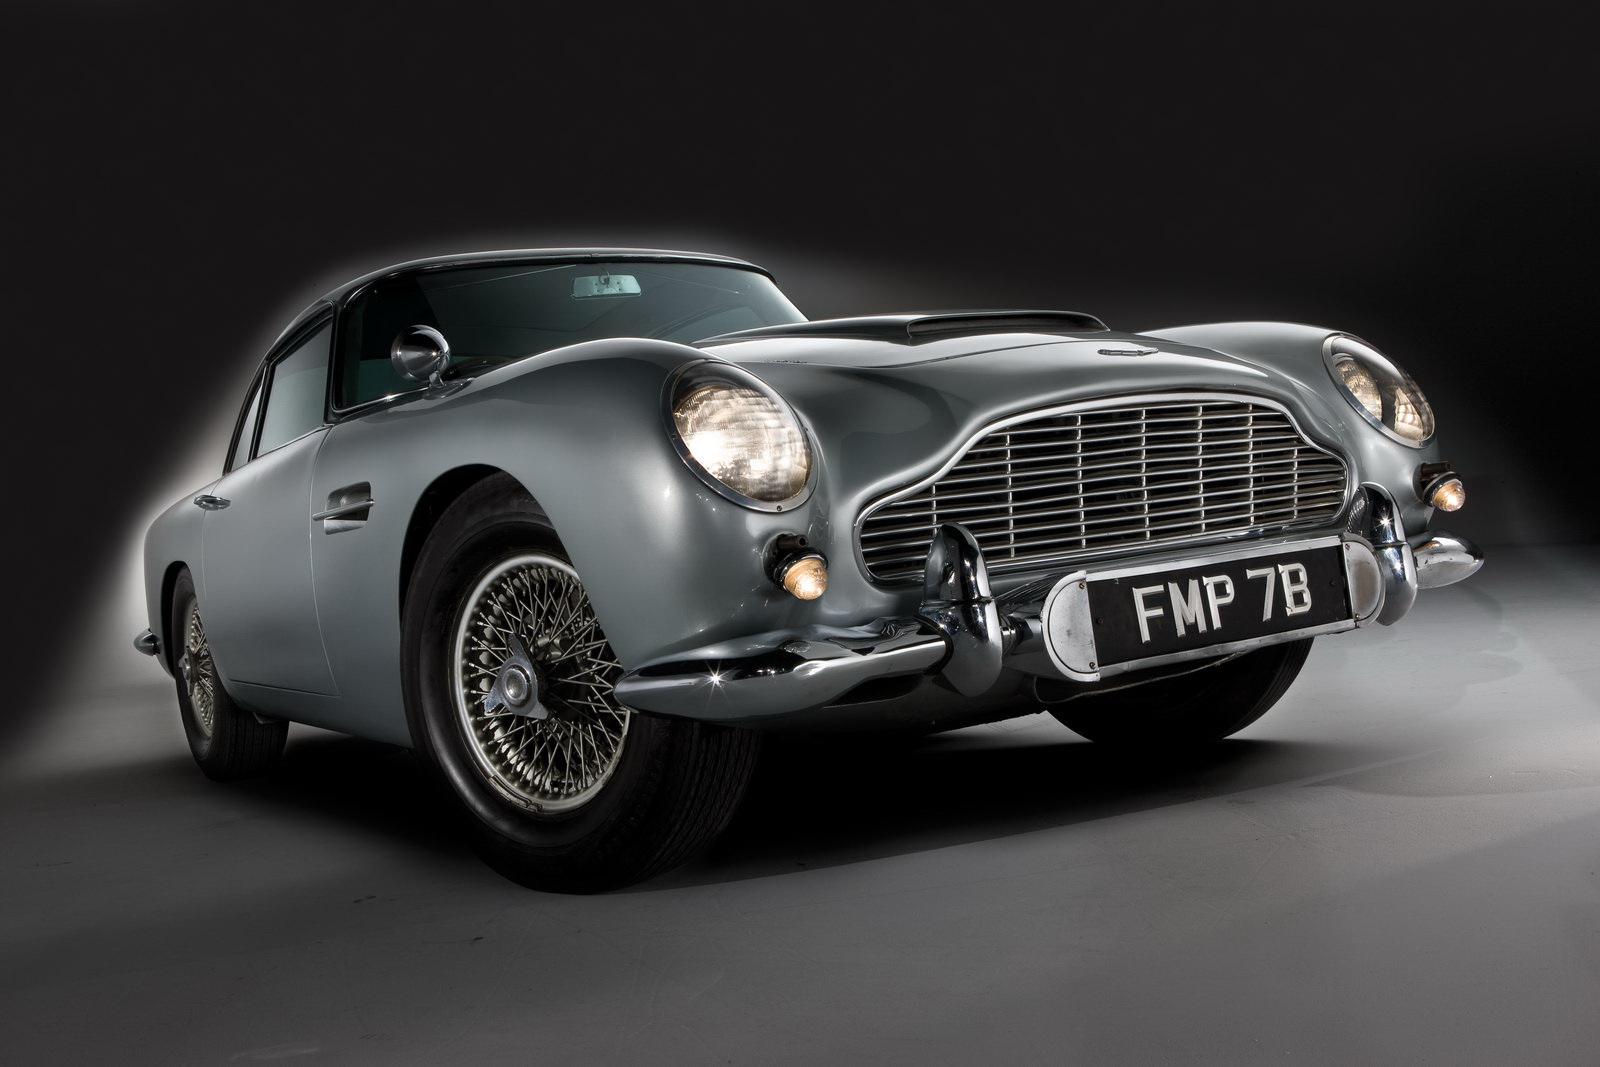 James-Bond-1964-Aston-Martin-DB5-1.jpg